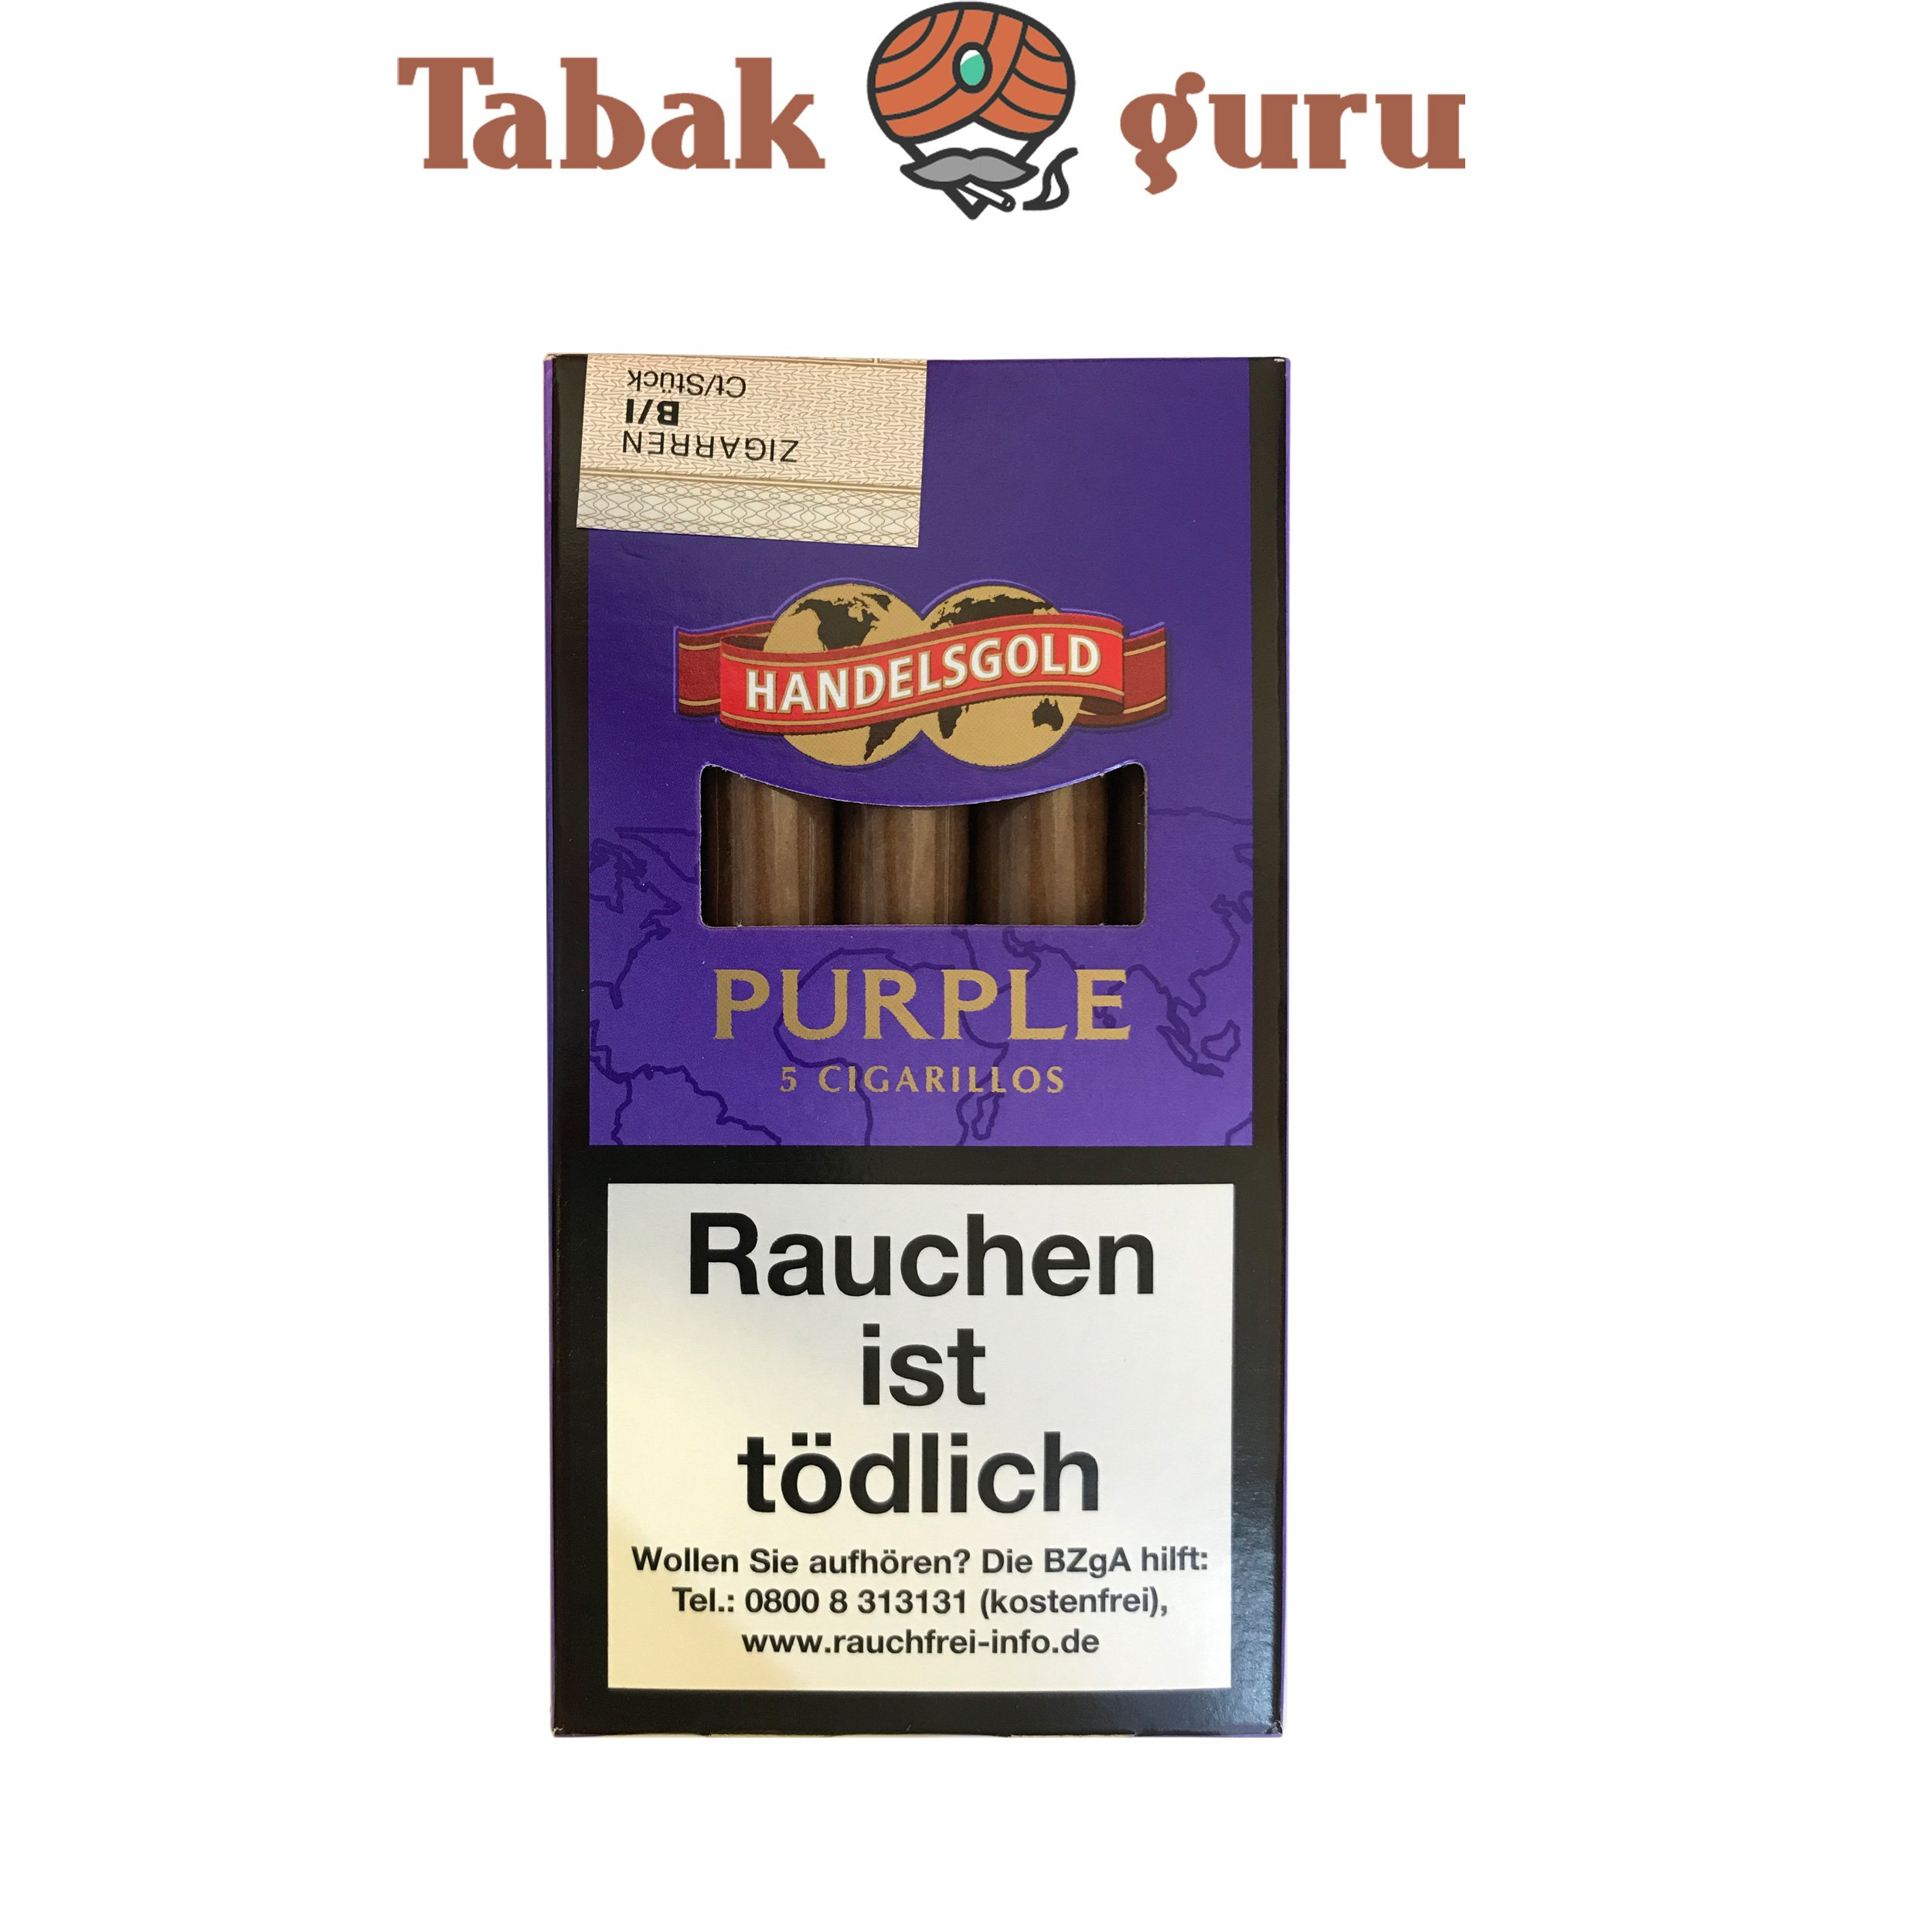 Handelsgold No. 191 Purple Zigarillos, 5 Stück